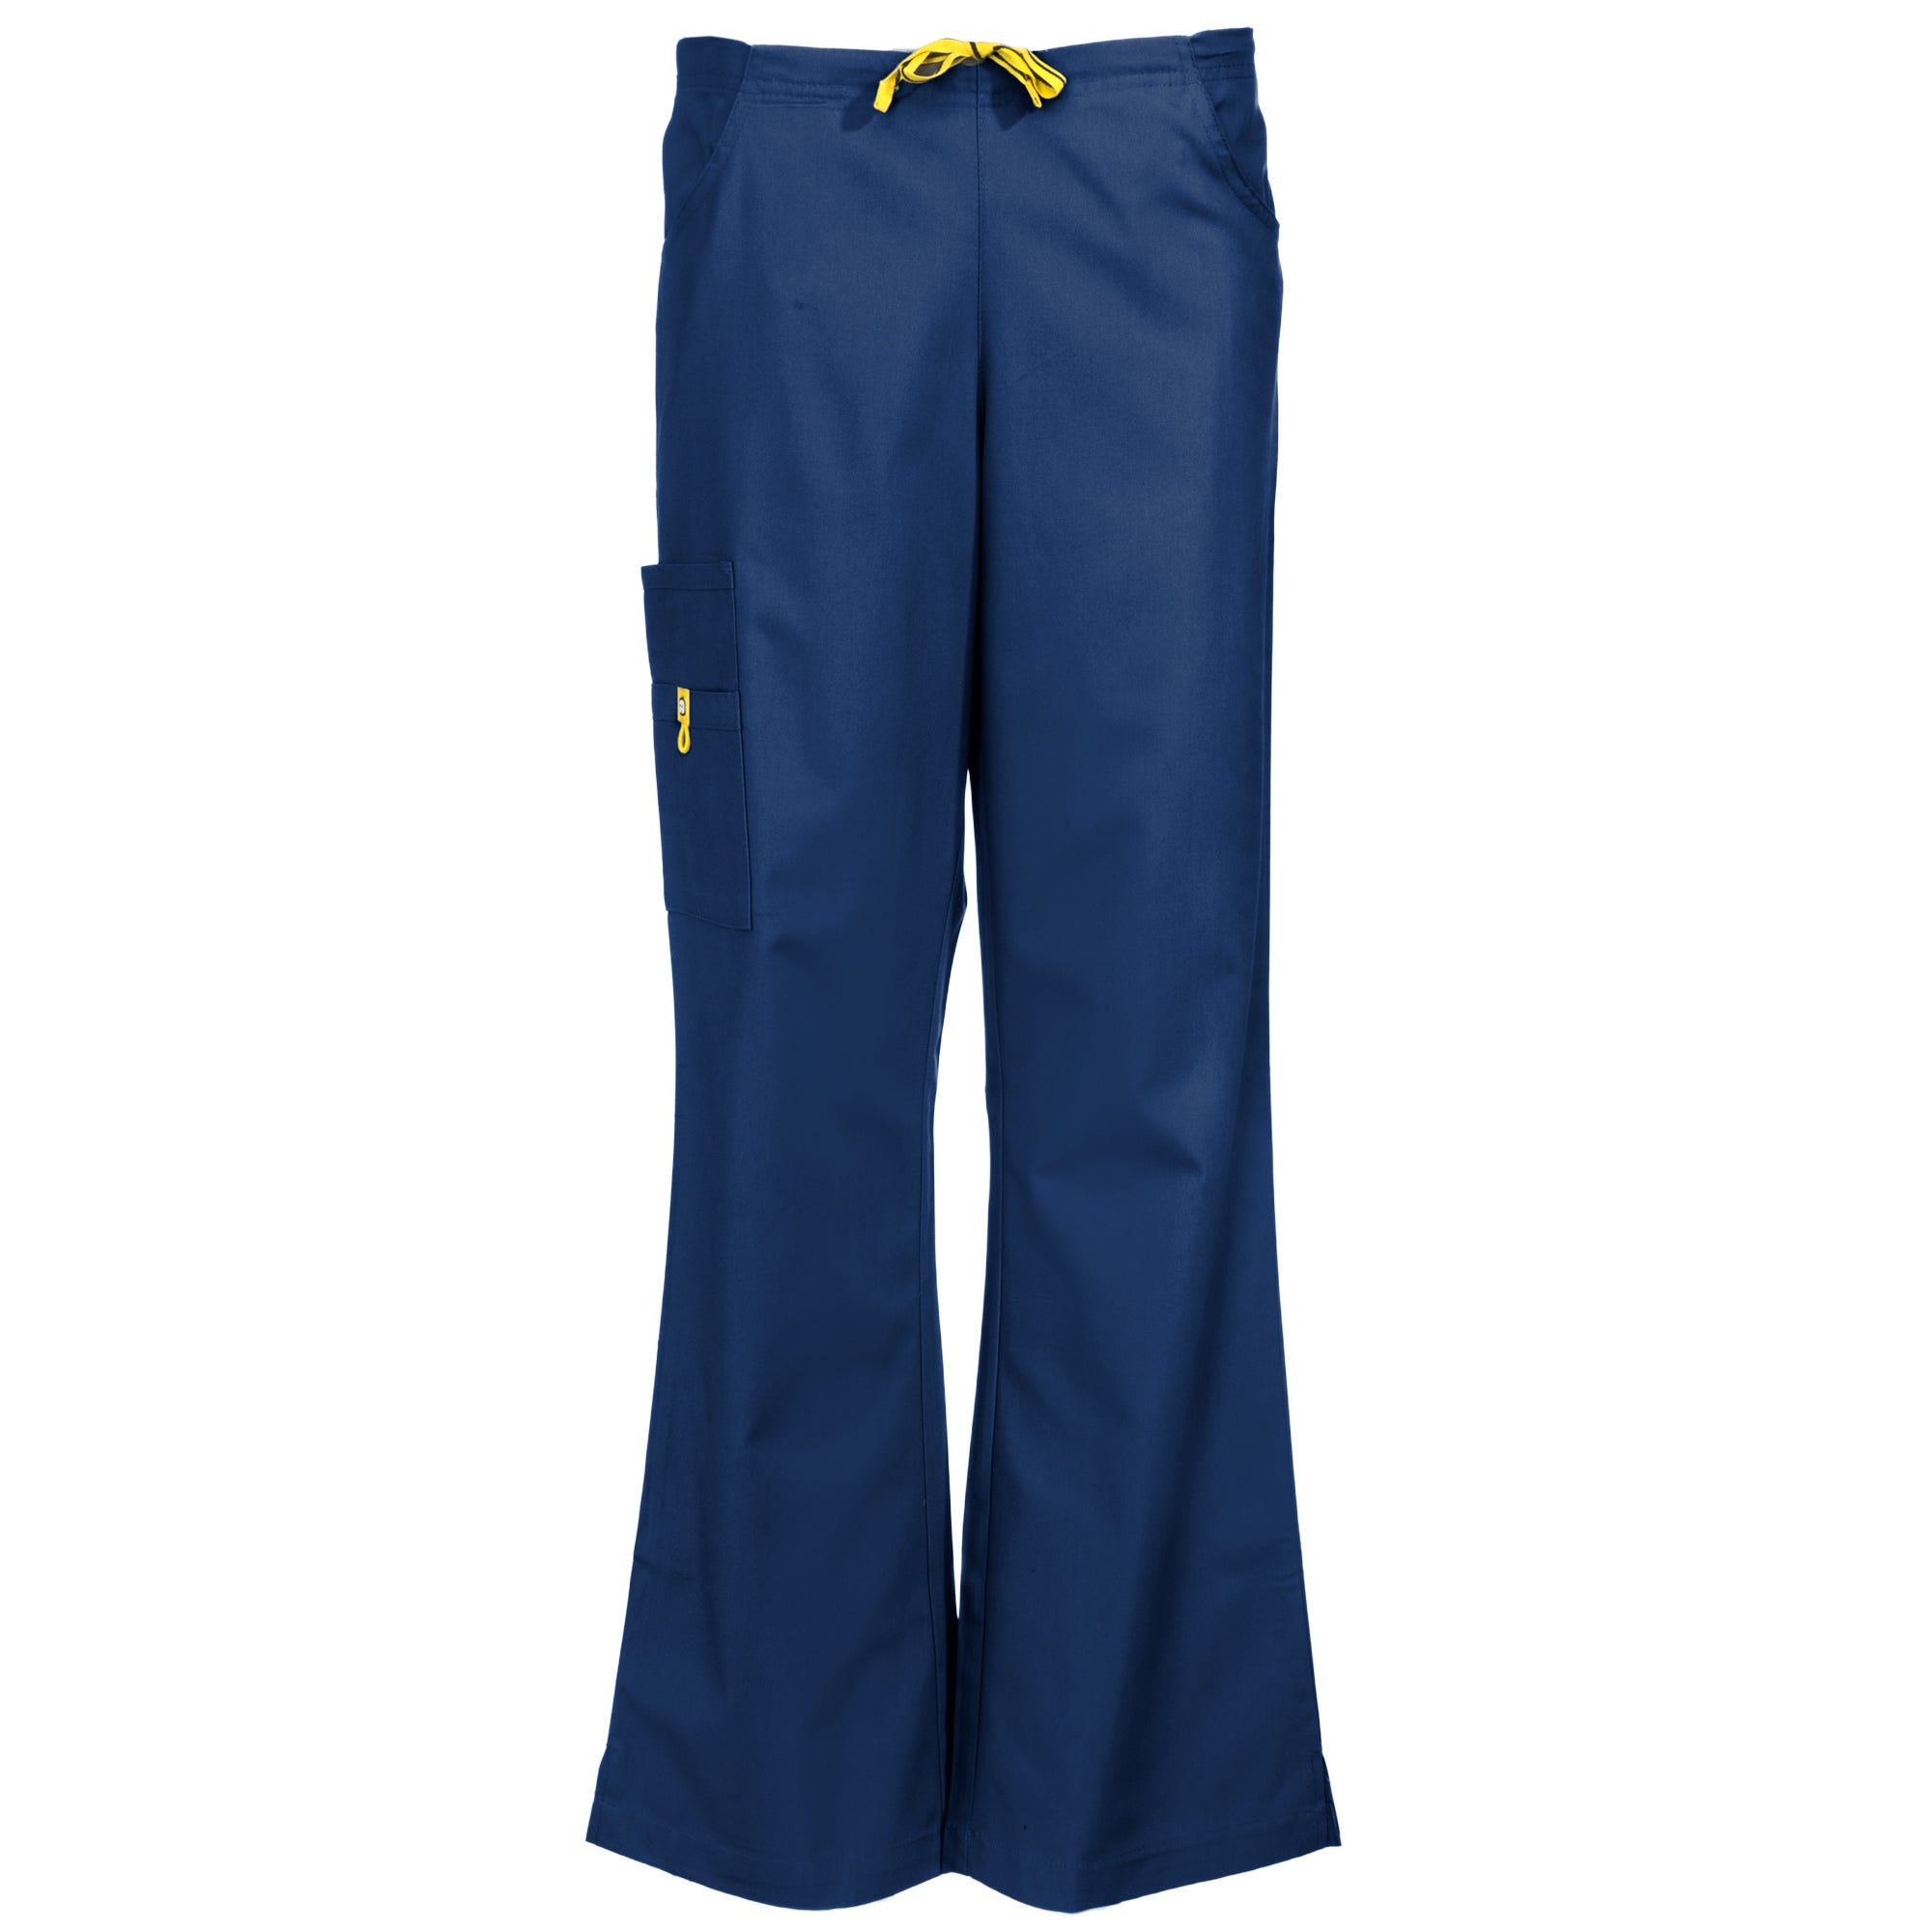 Wonderwink Women's 5026 NVY Romeo Navy Blue Flare Leg Cotton/Poly Scrub Bottoms